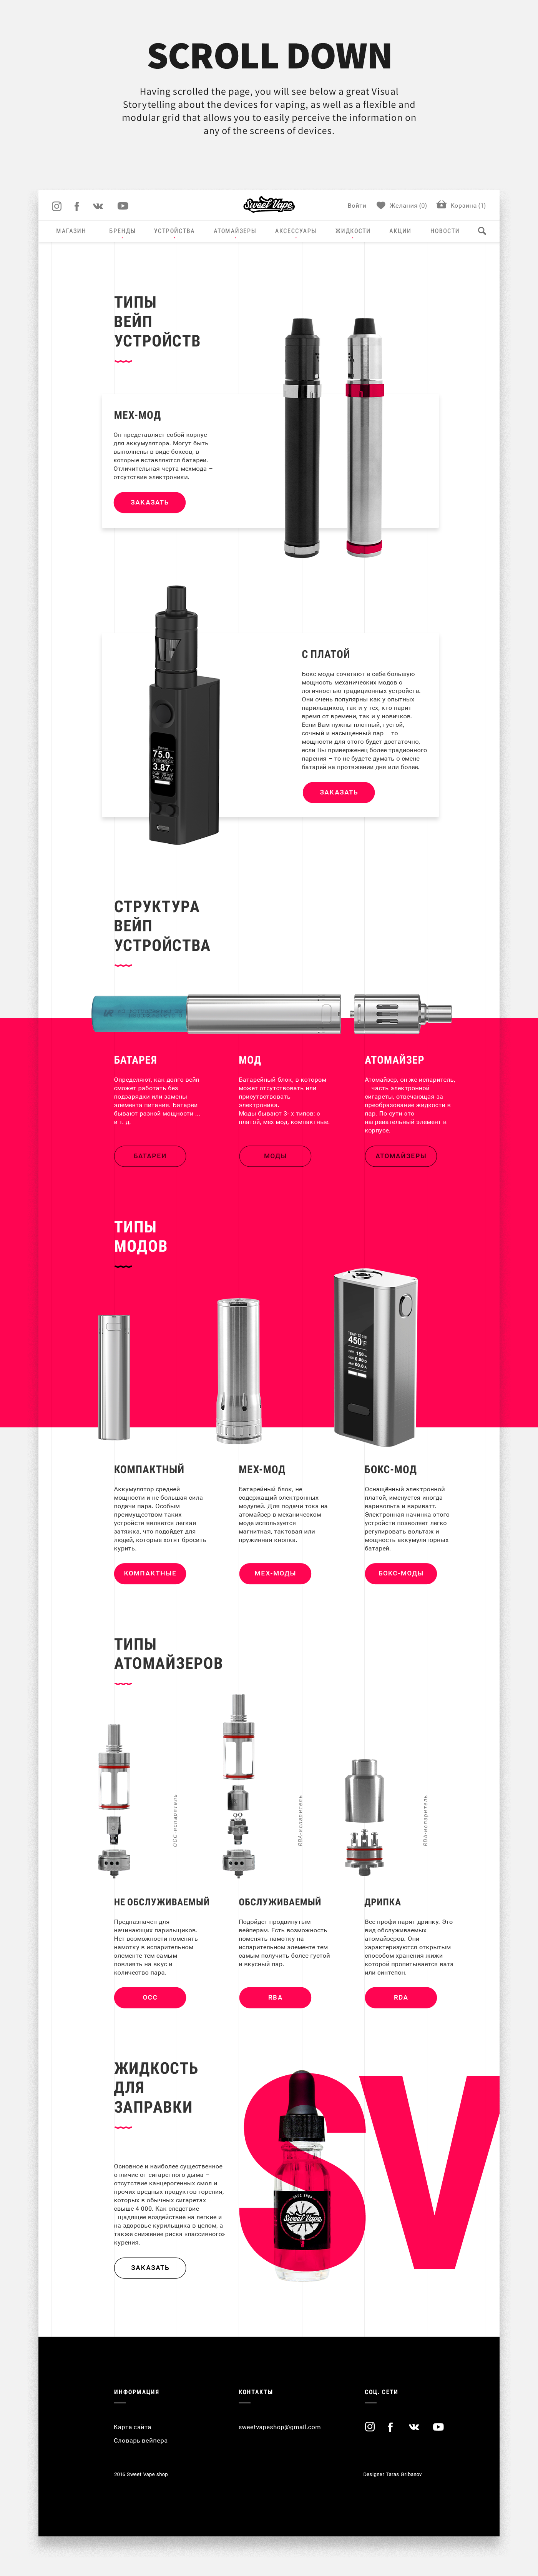 vaping Vape vapor electronic cigarettes storytelling   landing page online store business business card modular grid responcive design visual identity smoke sweet clean